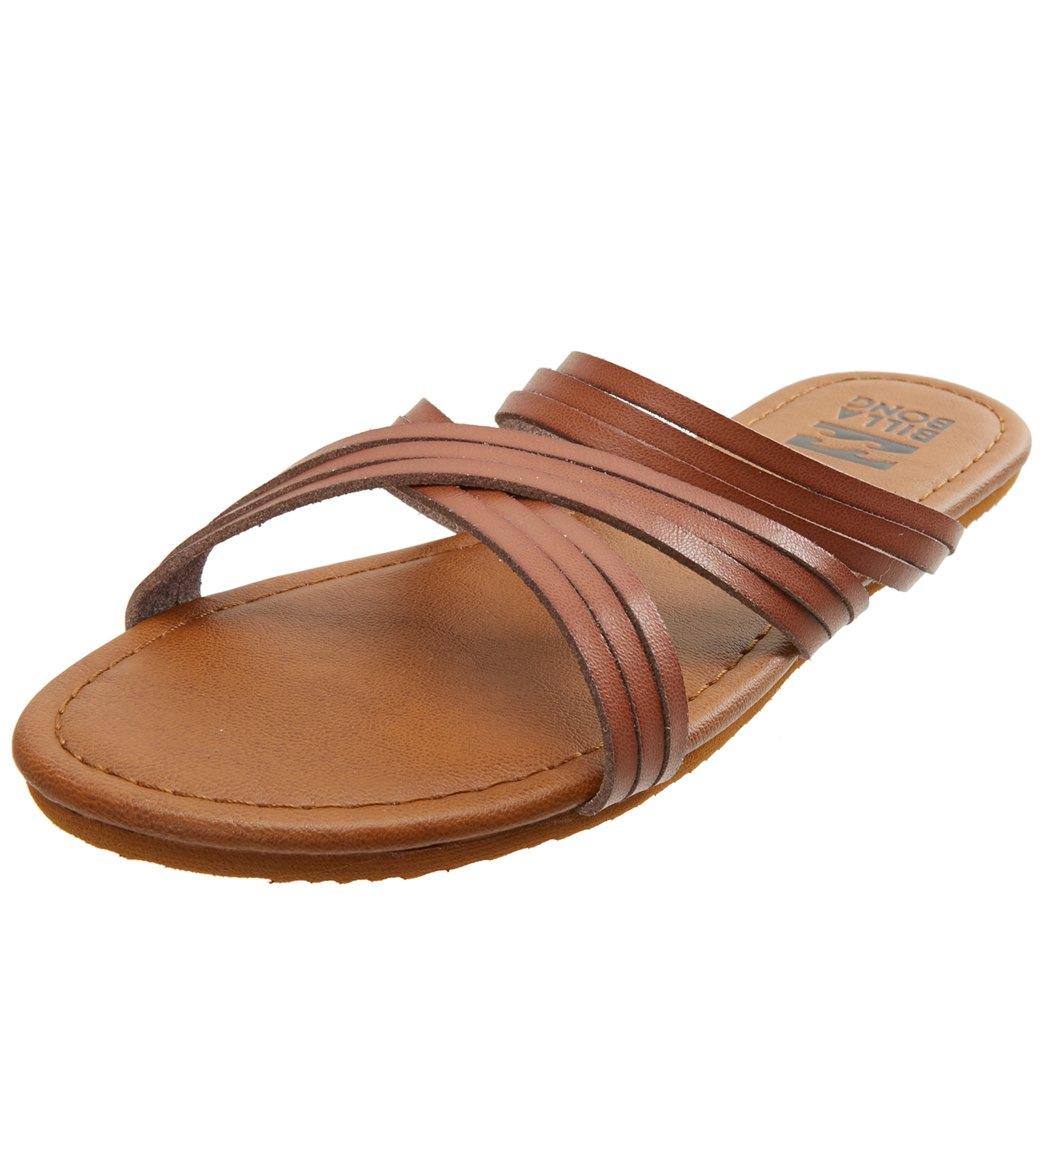 c6ac682bd Billabong Women s Sandy Toes Slide Sandal at SwimOutlet.com